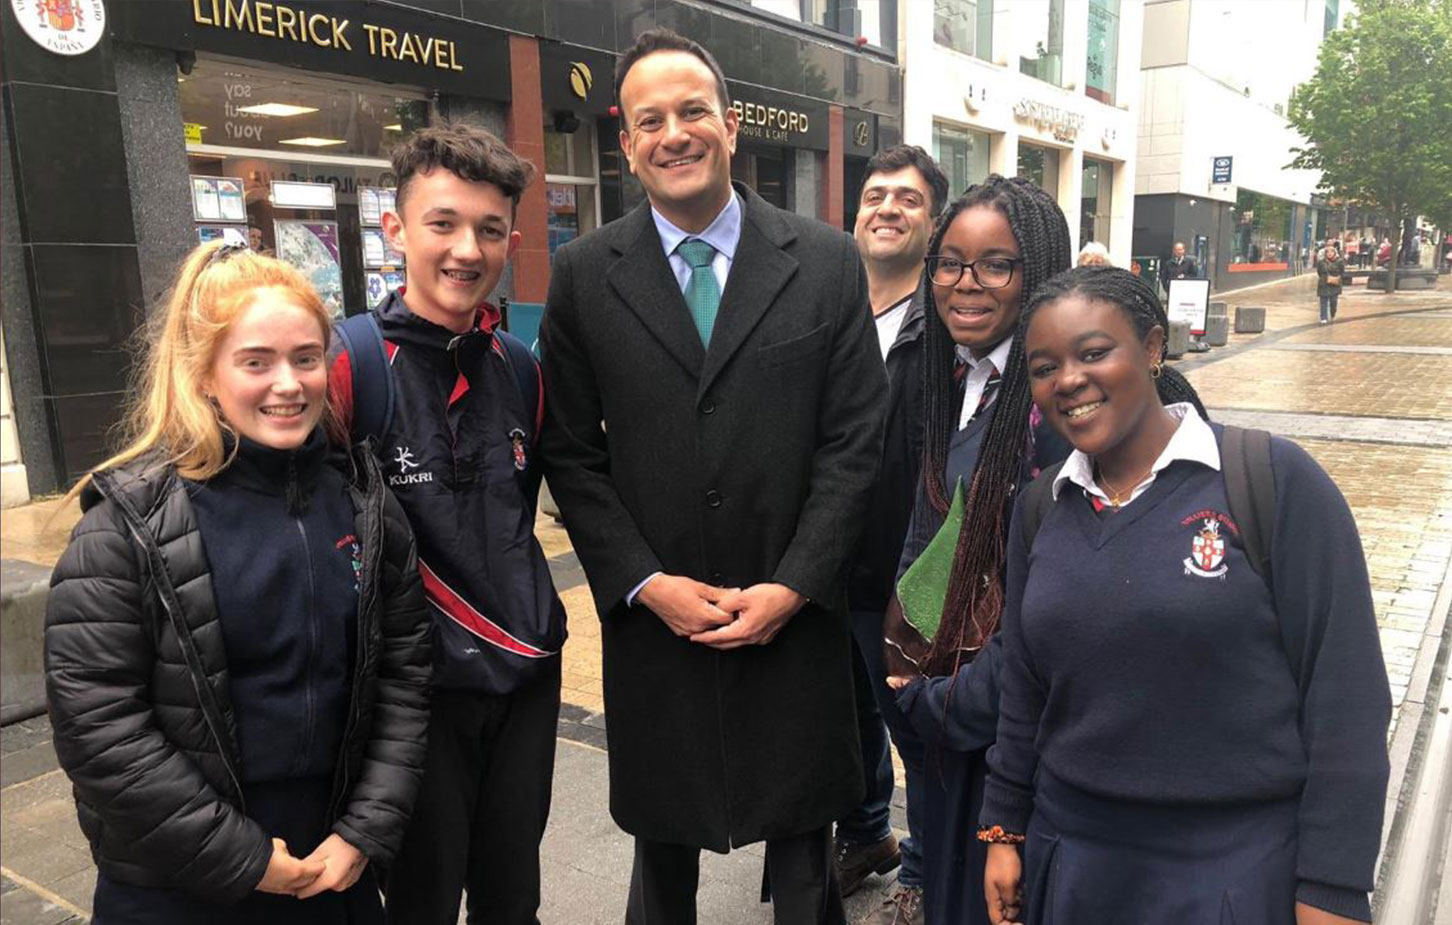 villiers-school-irland-teaser